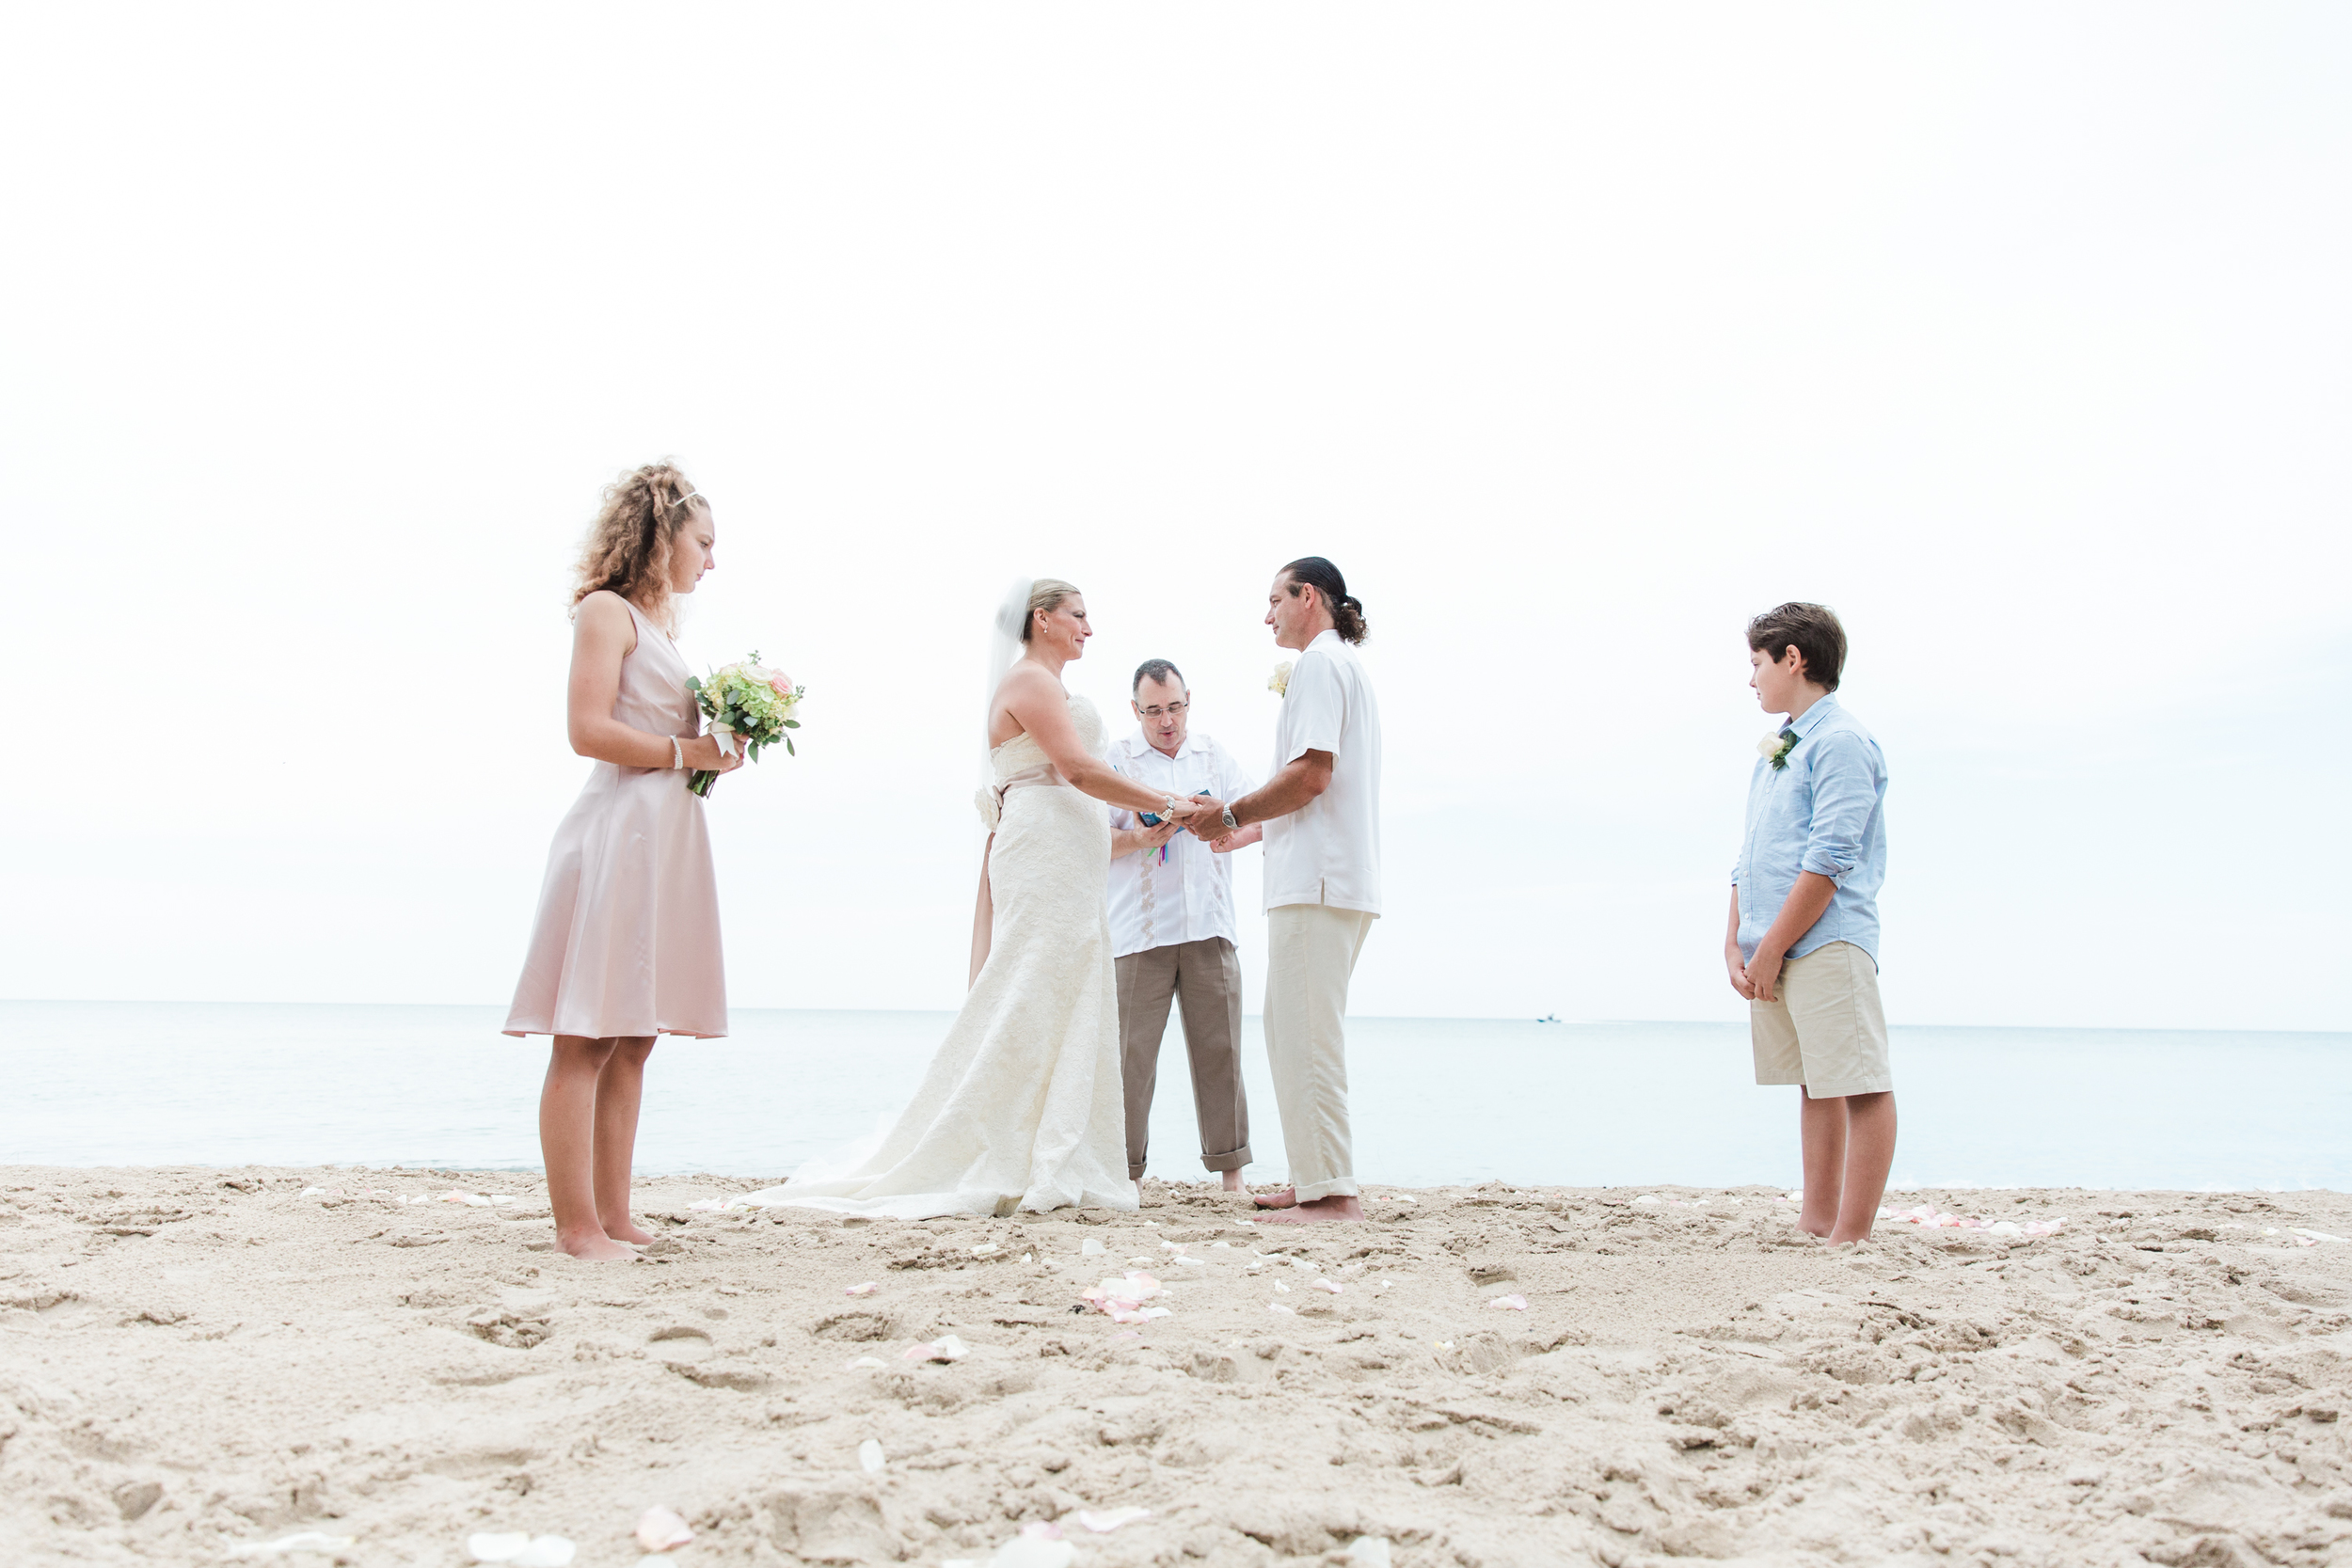 Bonphotage Michigan Wedding Photography